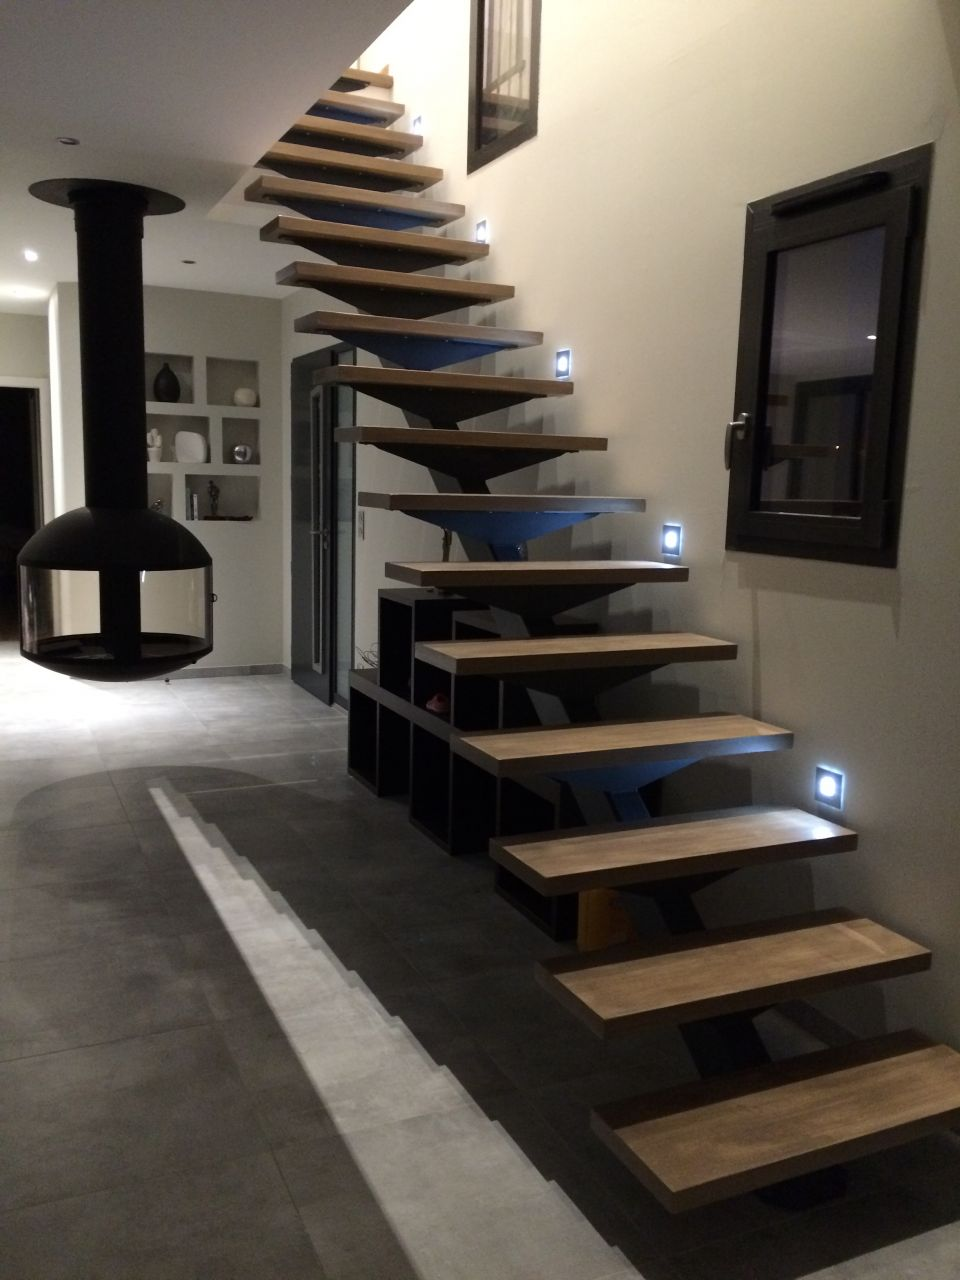 Escalier by night